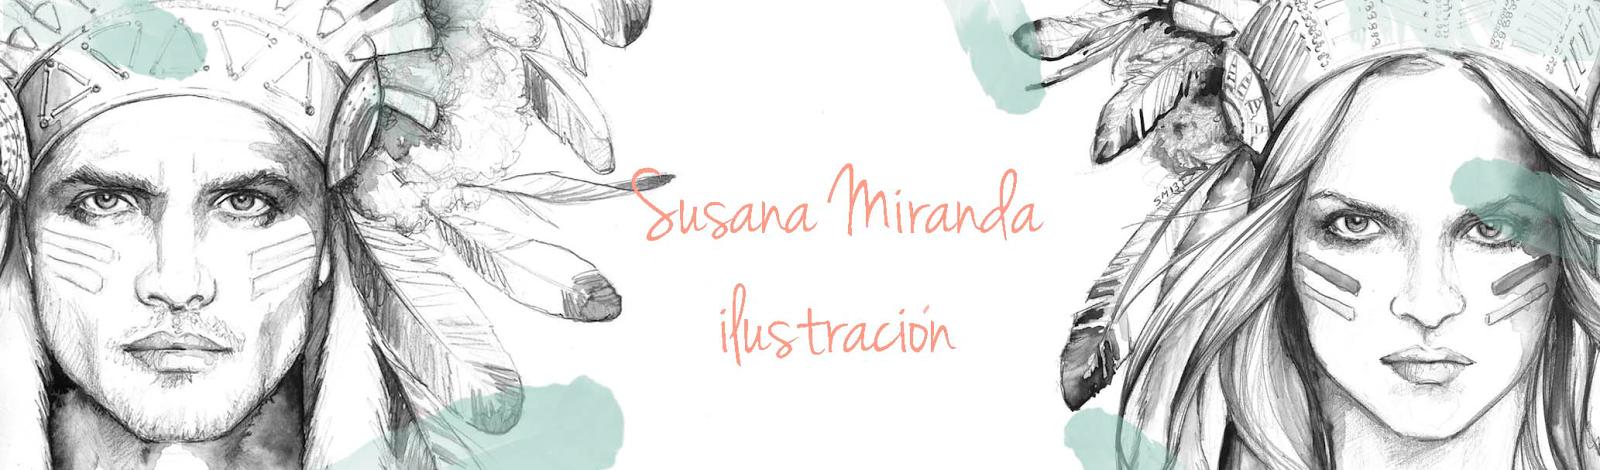 Susana Miranda Gallery